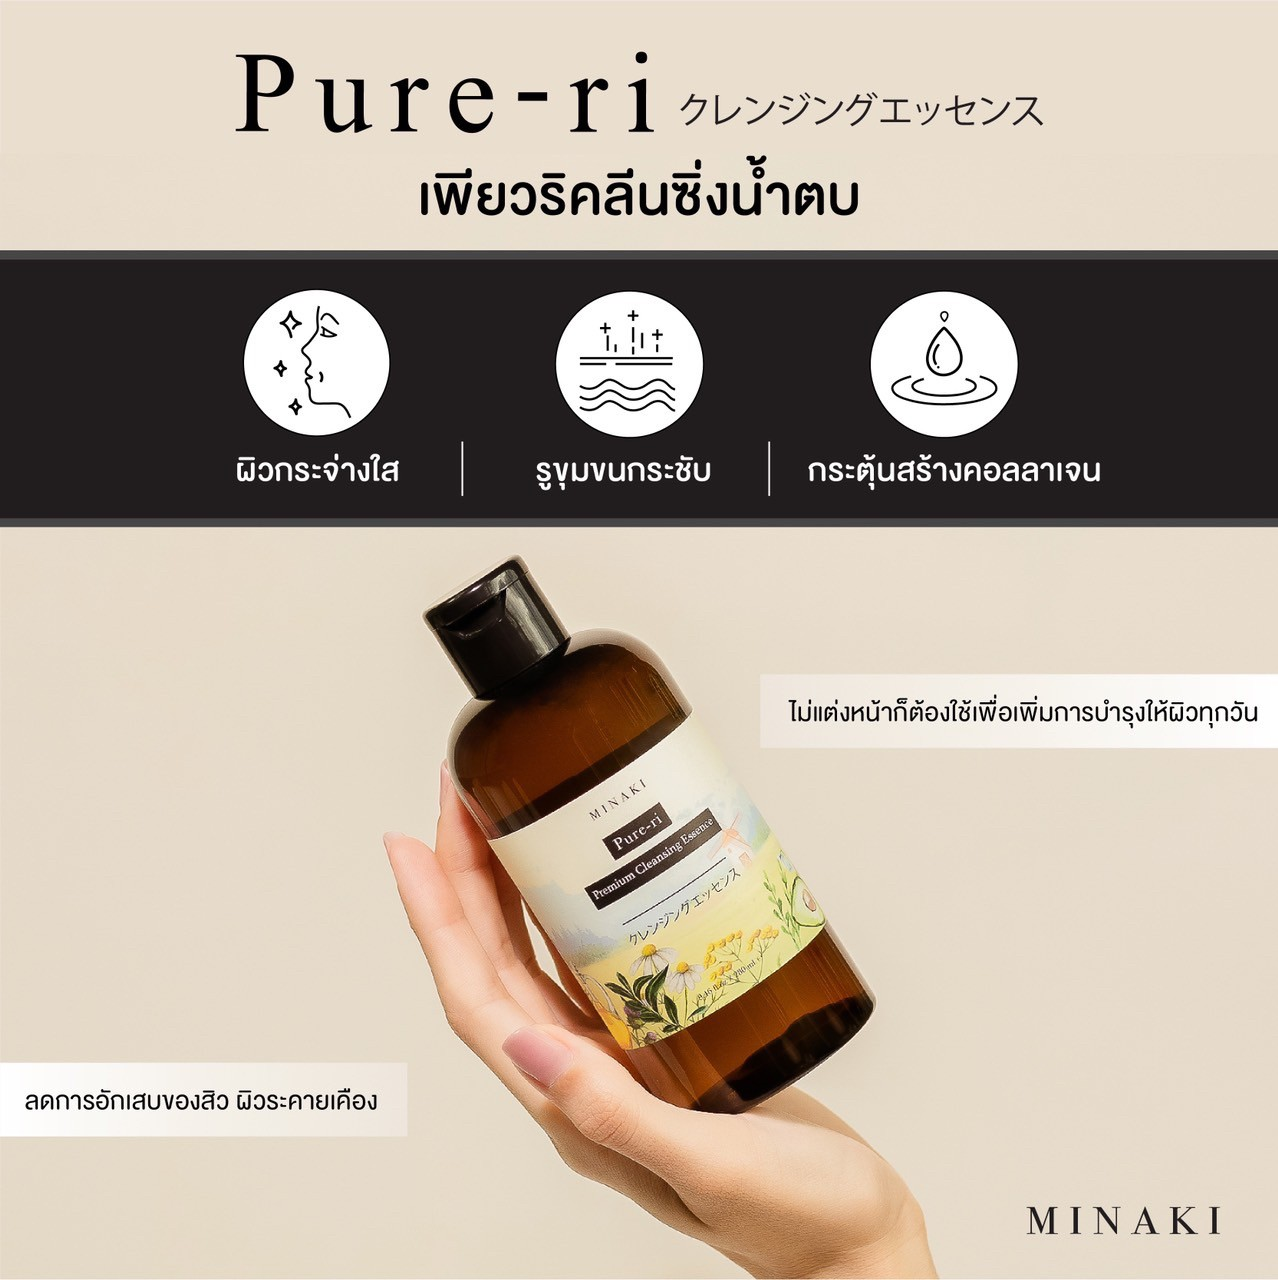 Minaki Pure-ri Perfect Cleansing Essence เพียวริ คลีนซิ่ง 280 ml